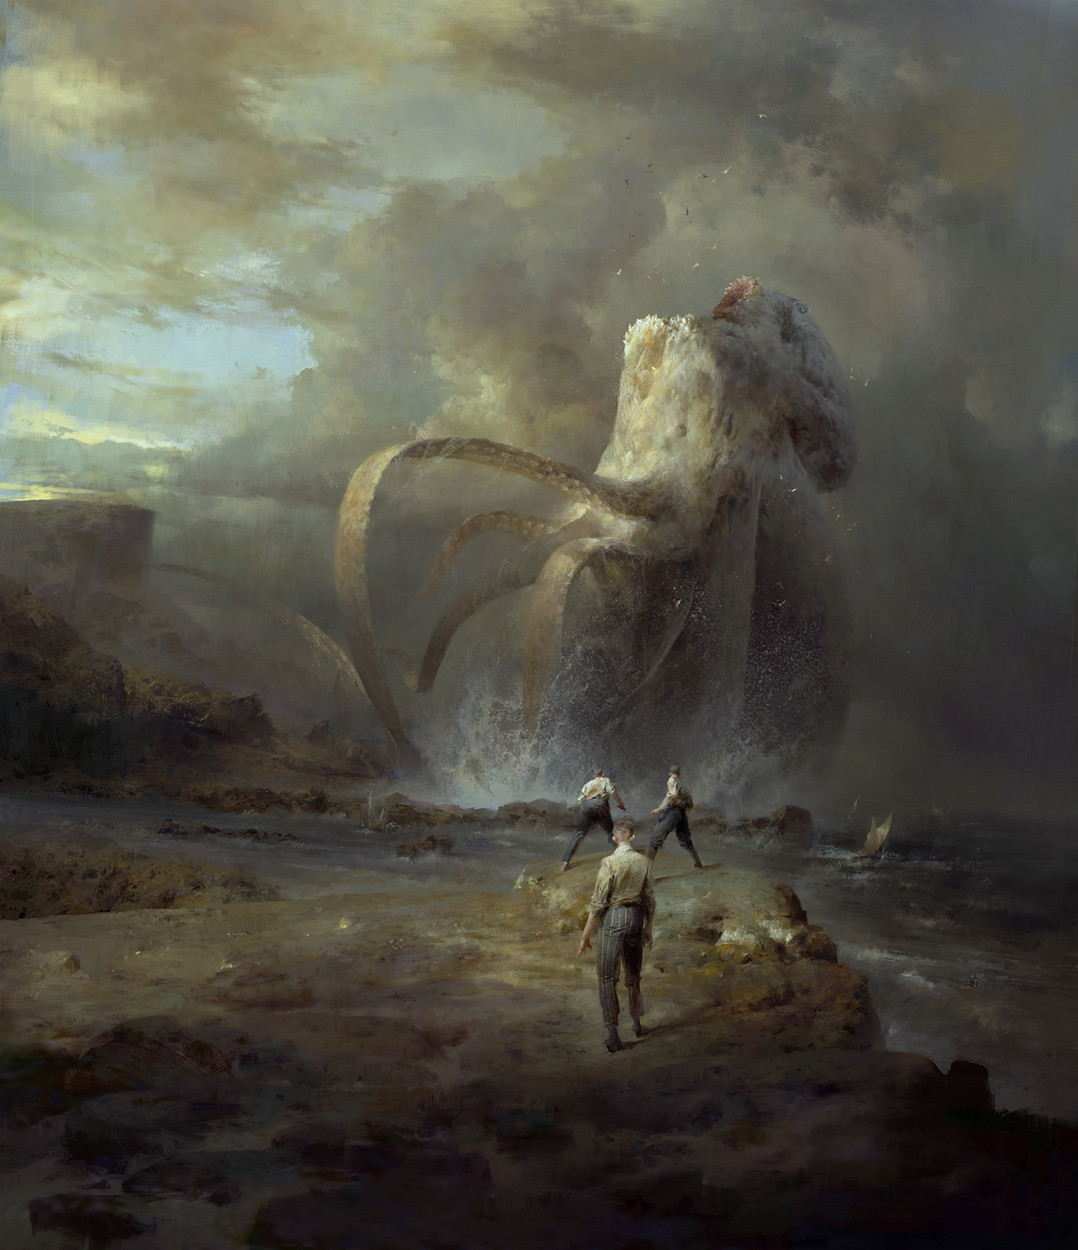 Dishonored 2 Serkonan Legends Artwork by Piotr Jablonski